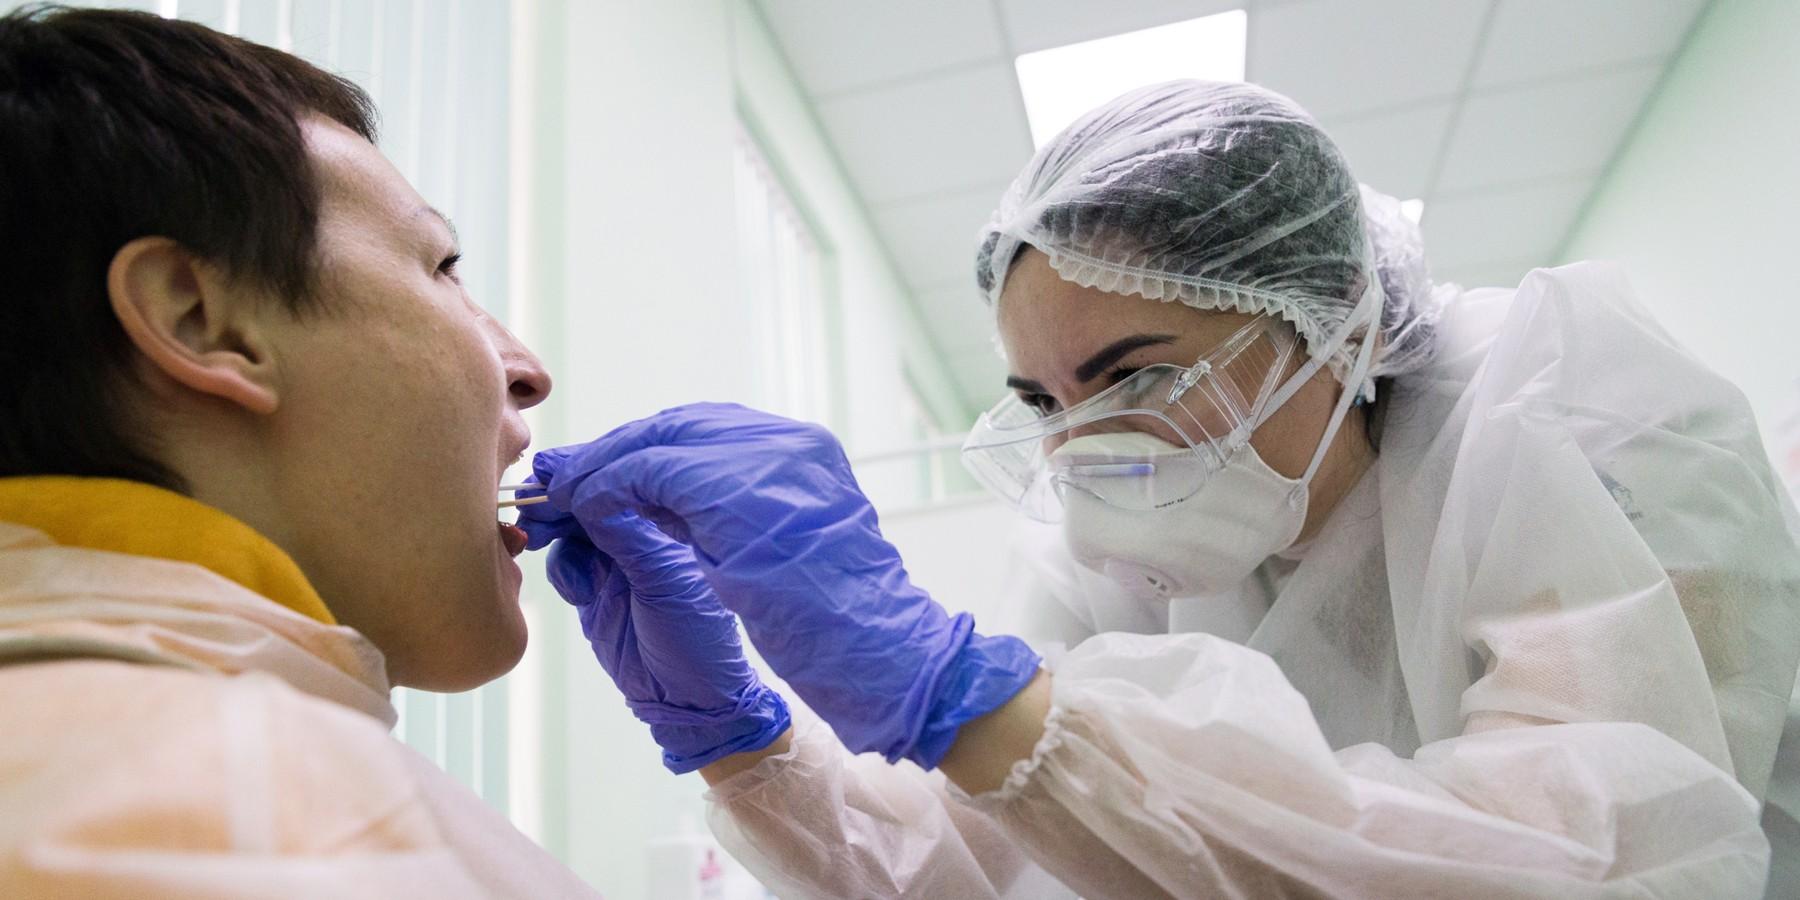 Тестирование на COVID планируют внести в программу госгарантий с 2021 года